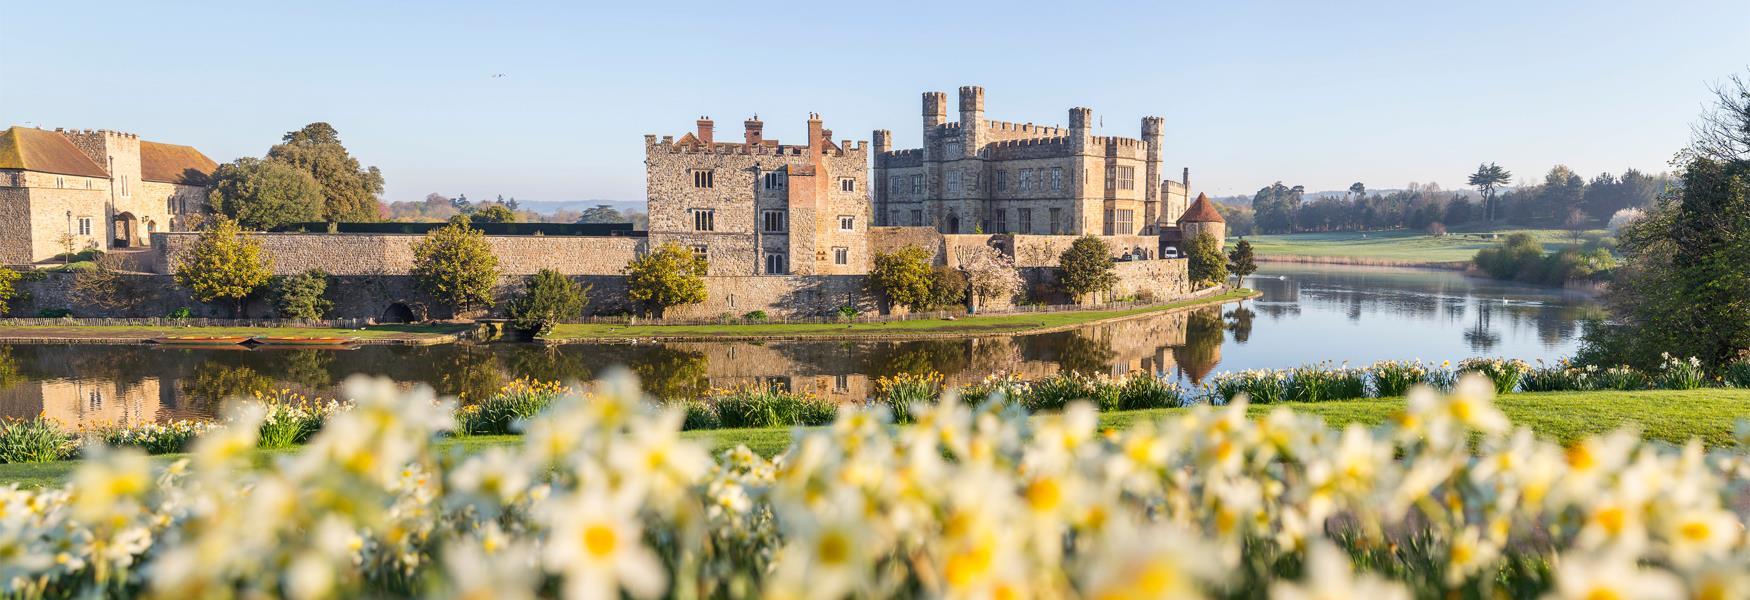 Leeds Castle Daffodils